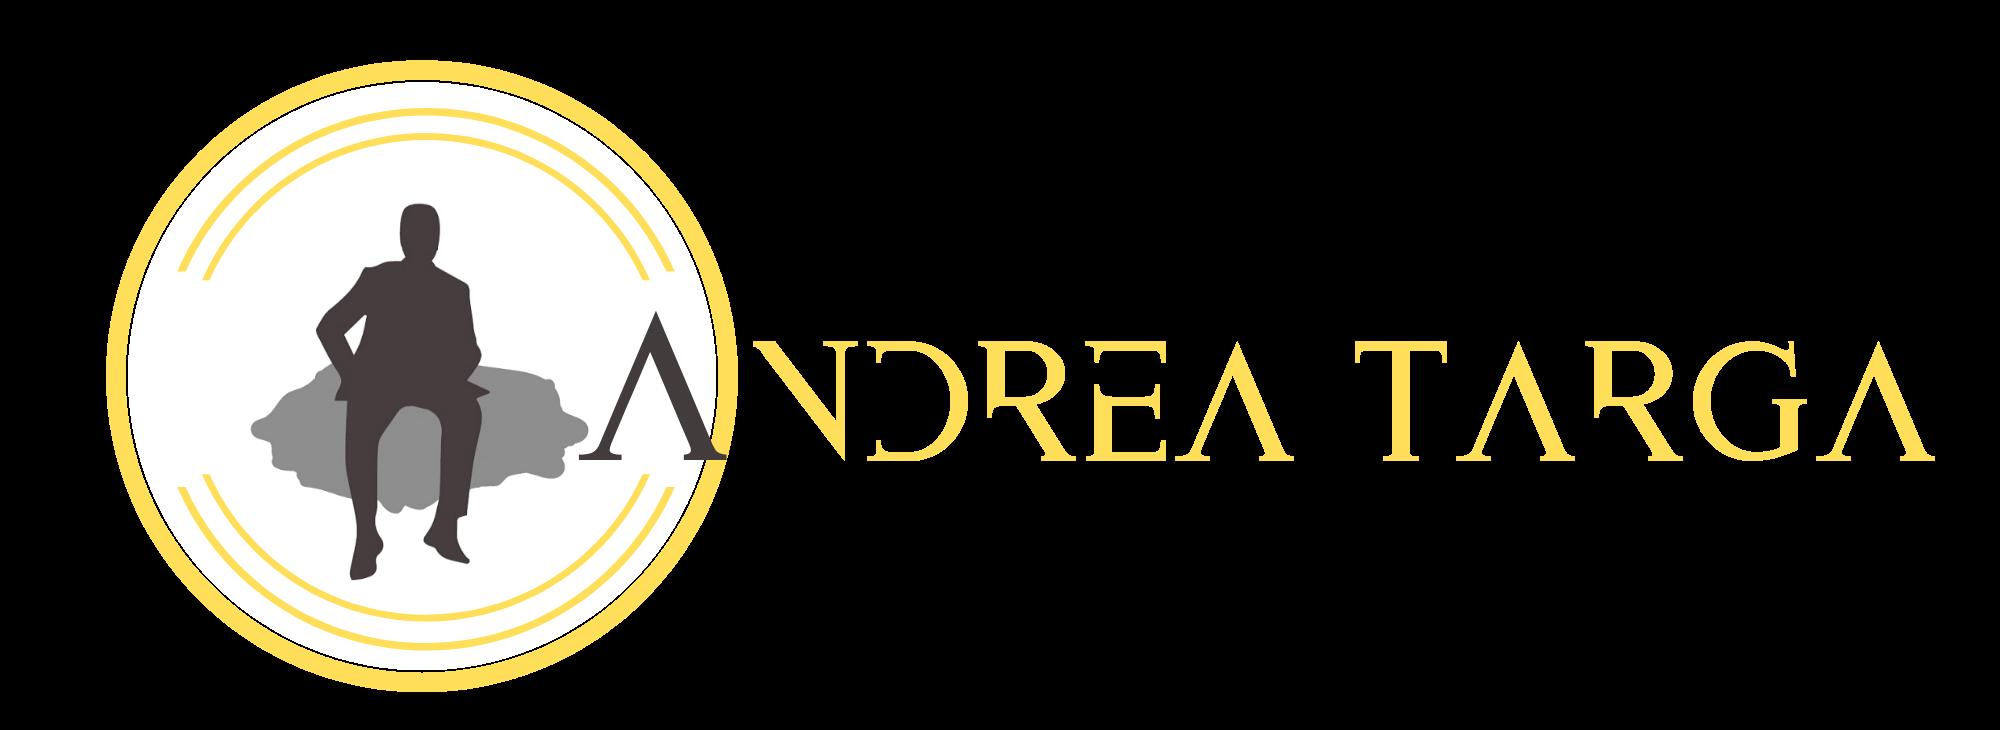 ANDREA TARGA